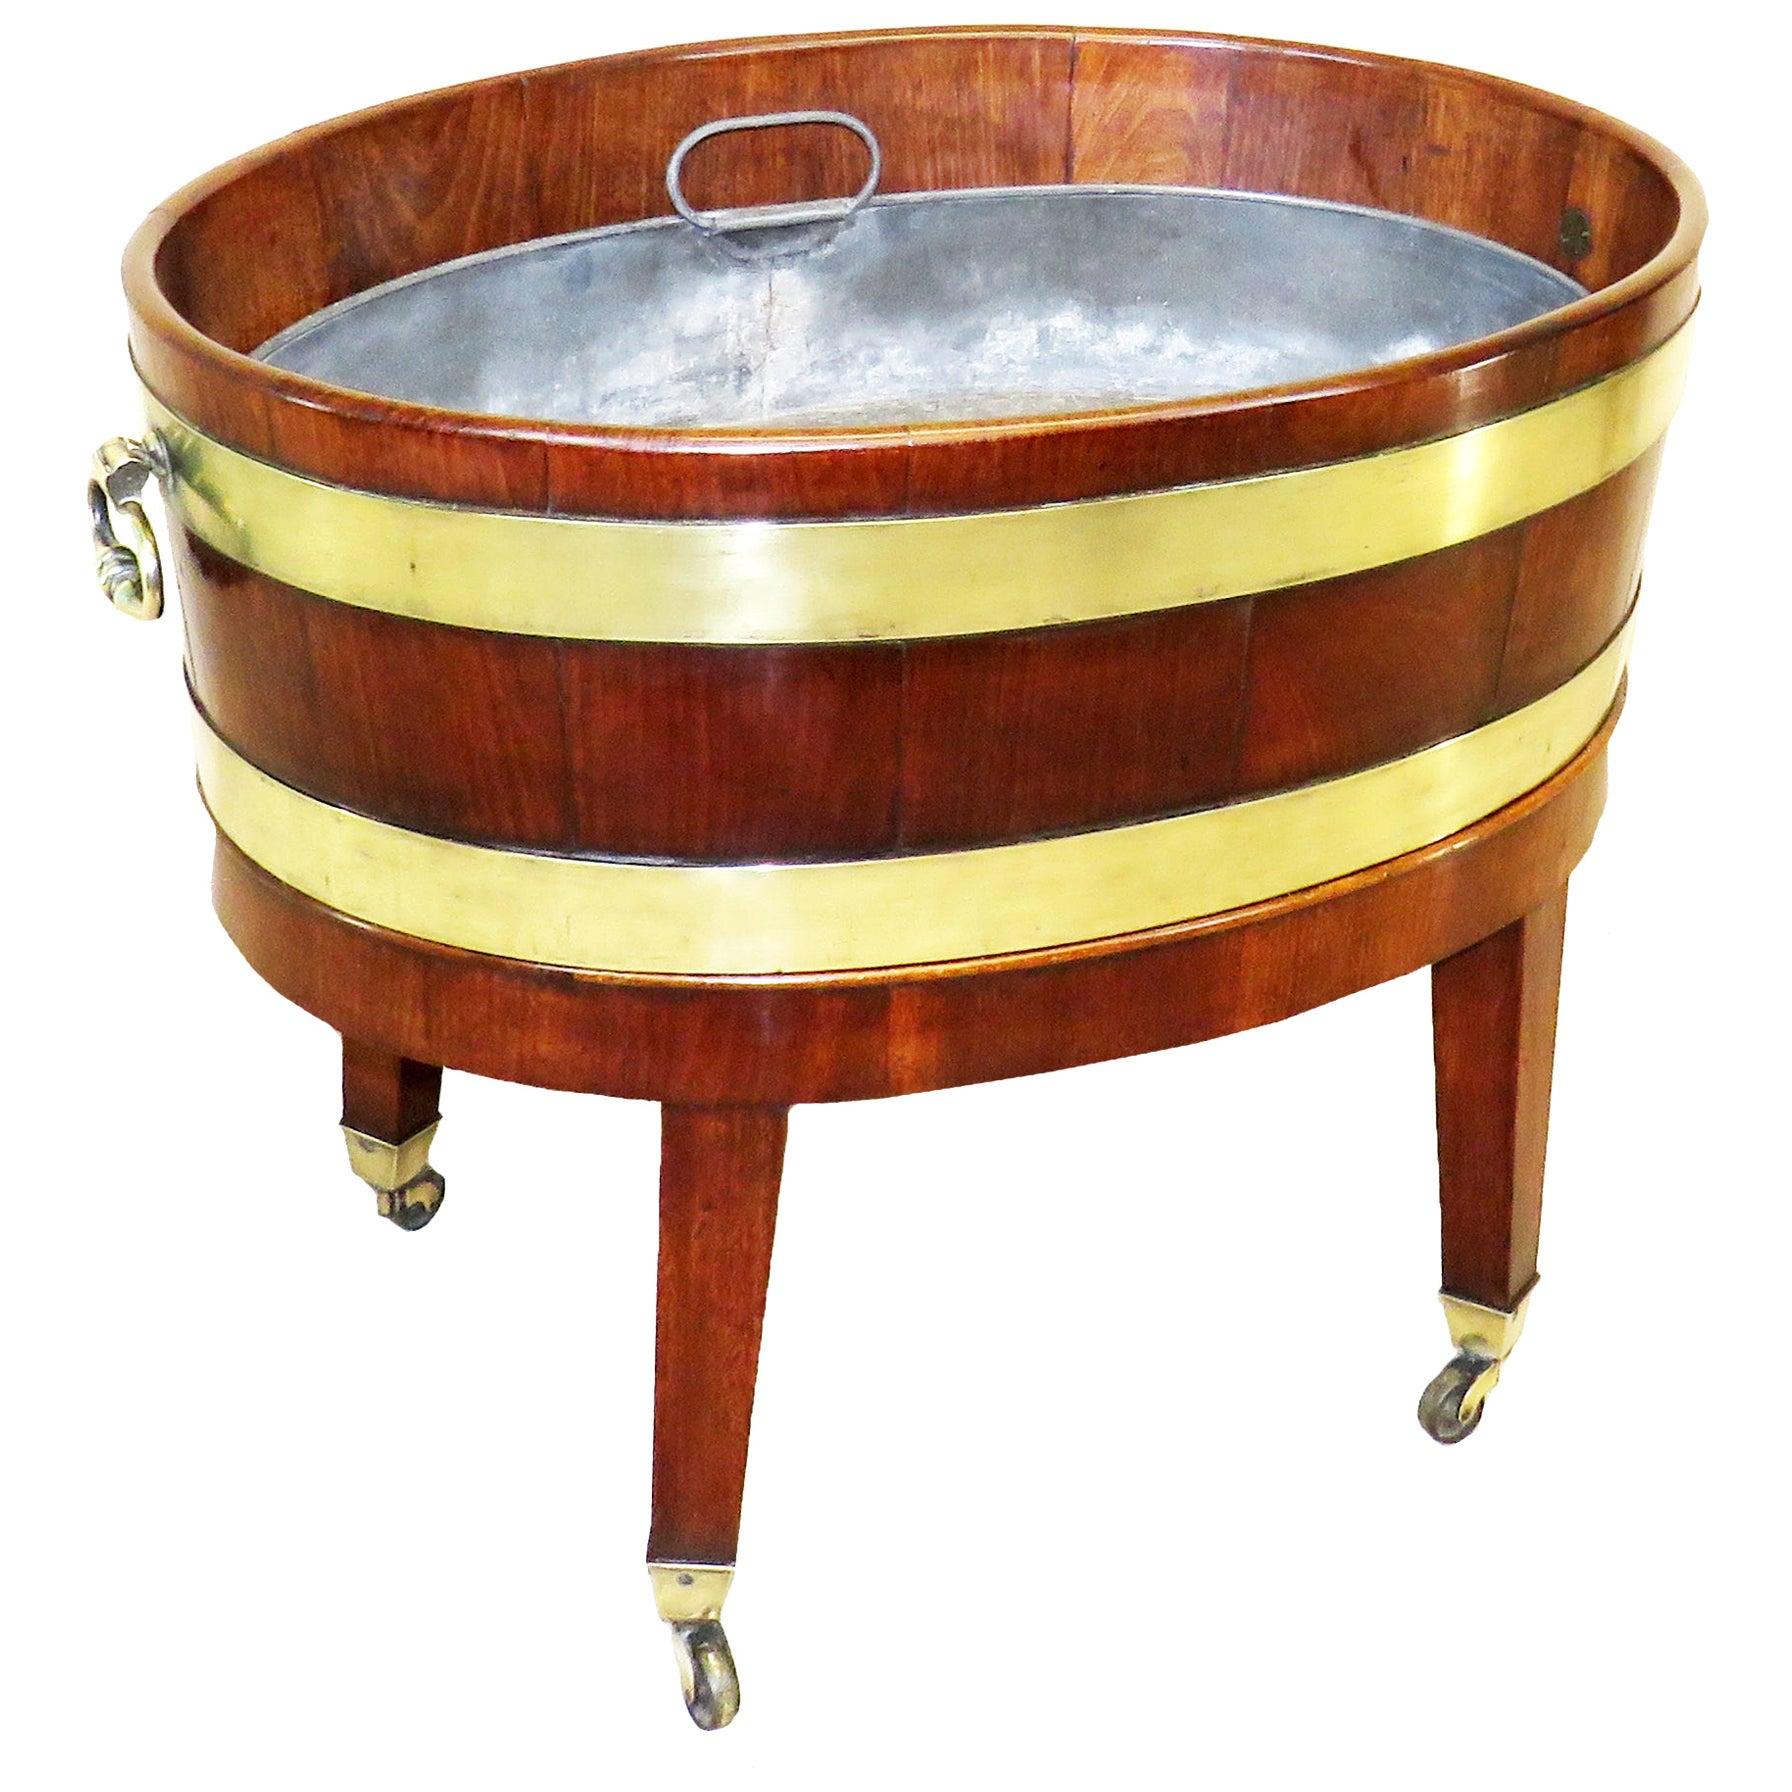 Georgian 18th Century Mahogany Oval Open Wine Cooler